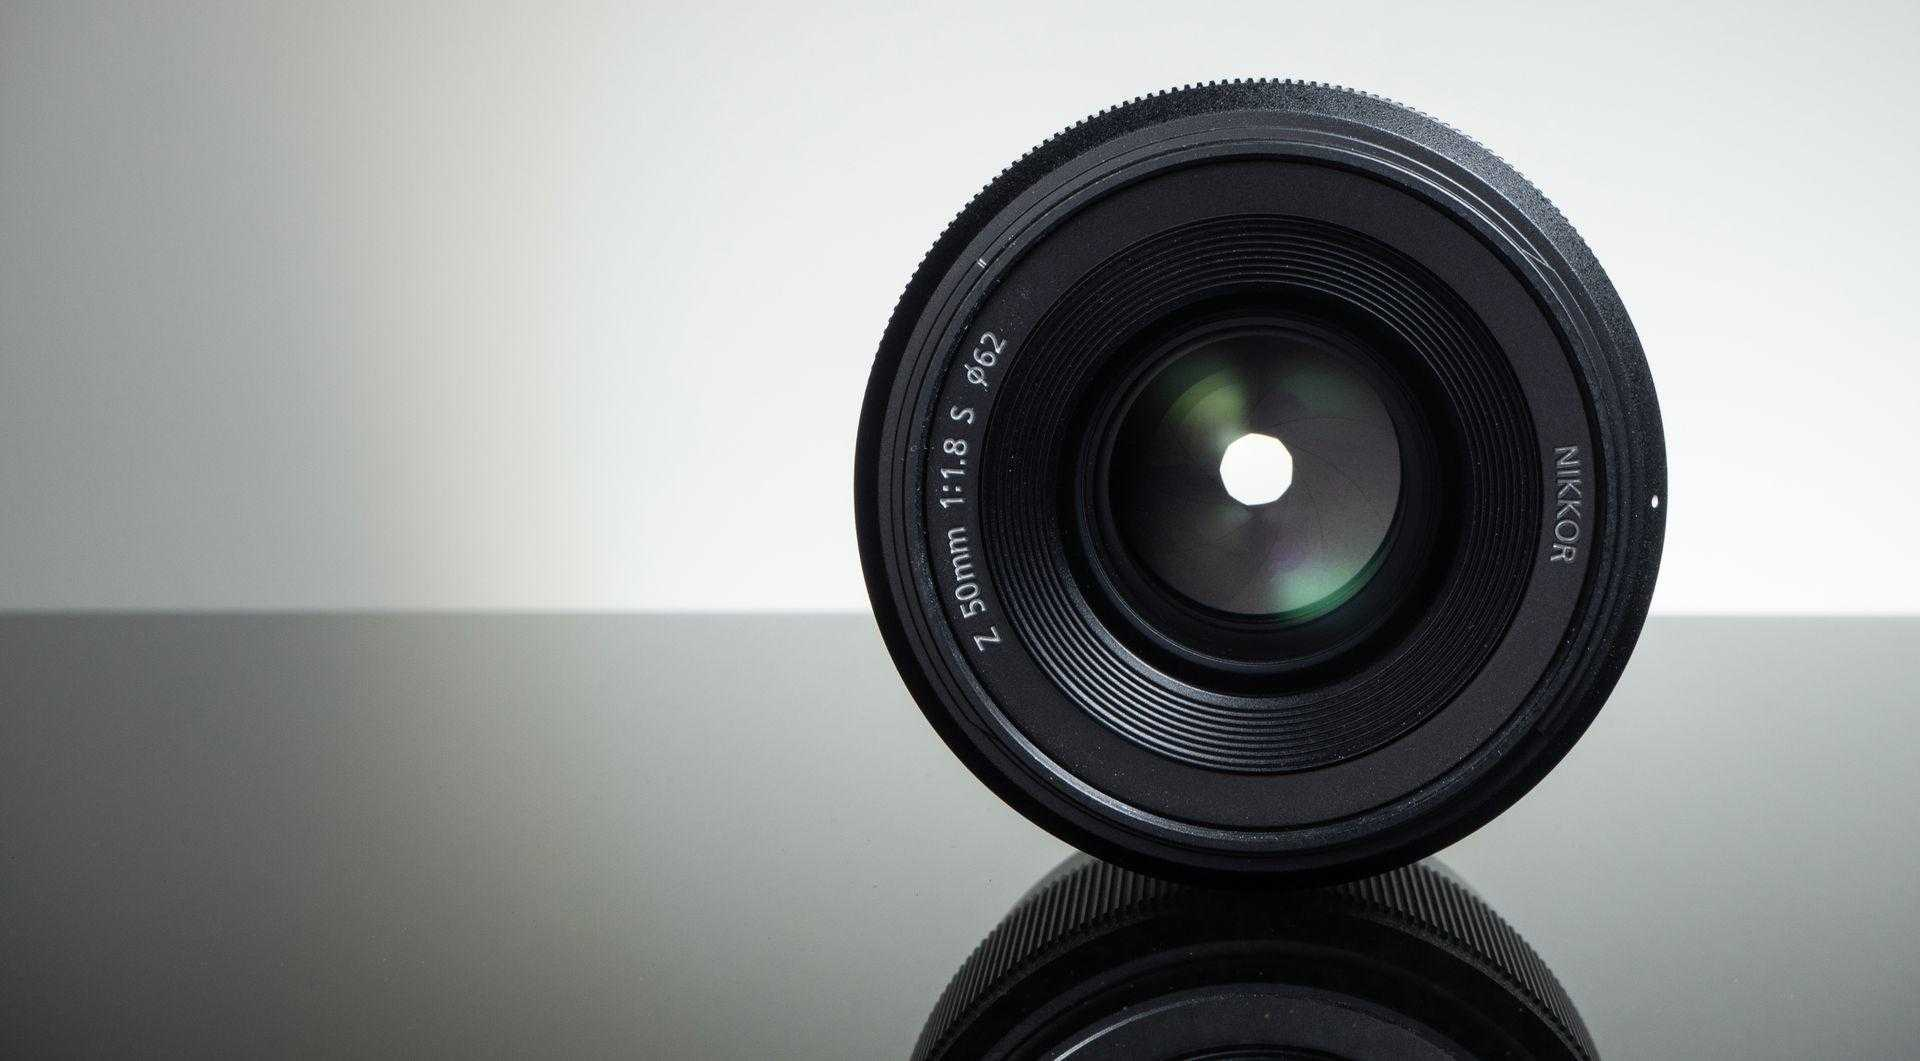 Обзор объектива Nikon NIKKOR Z 50mm f/1.8 S